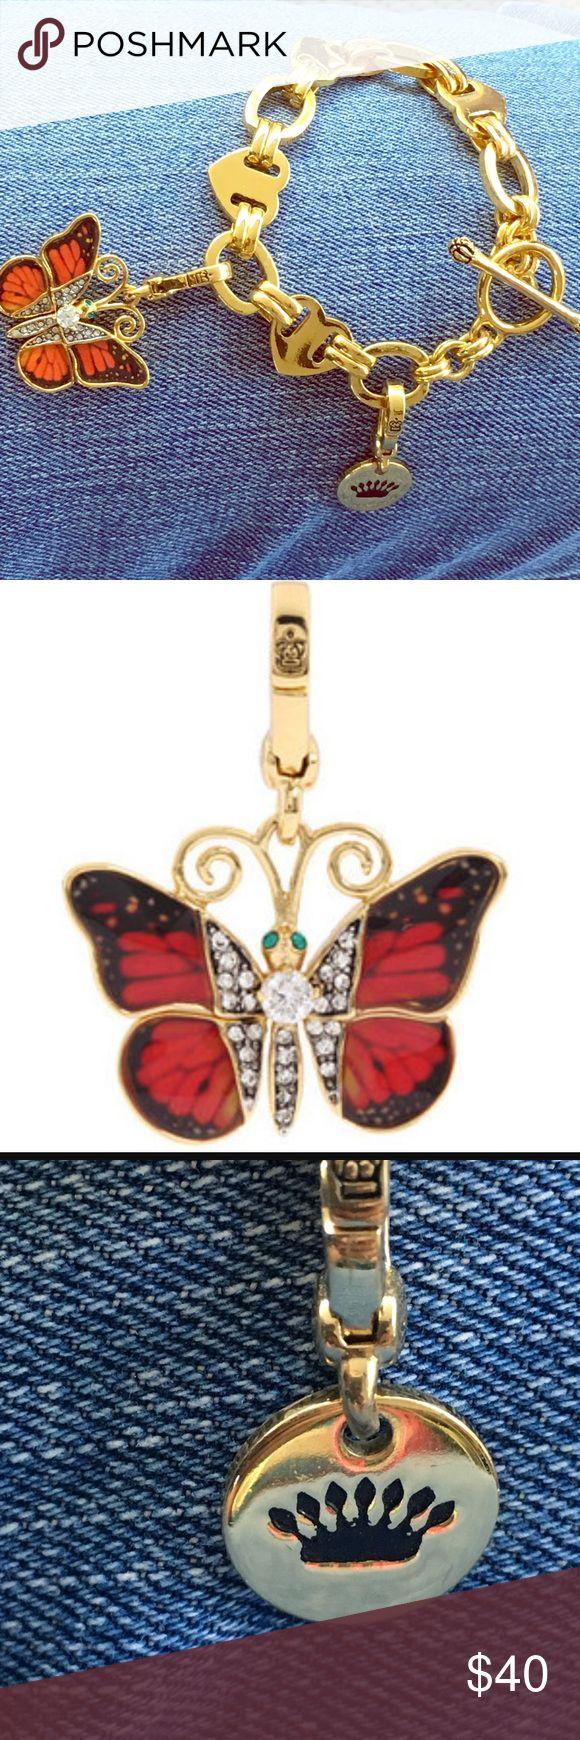 Juicy Couture Toggle Charm Bracelet Euc Charm Bracelet With Charms! Juicy  Couture Jewelry Bracelets